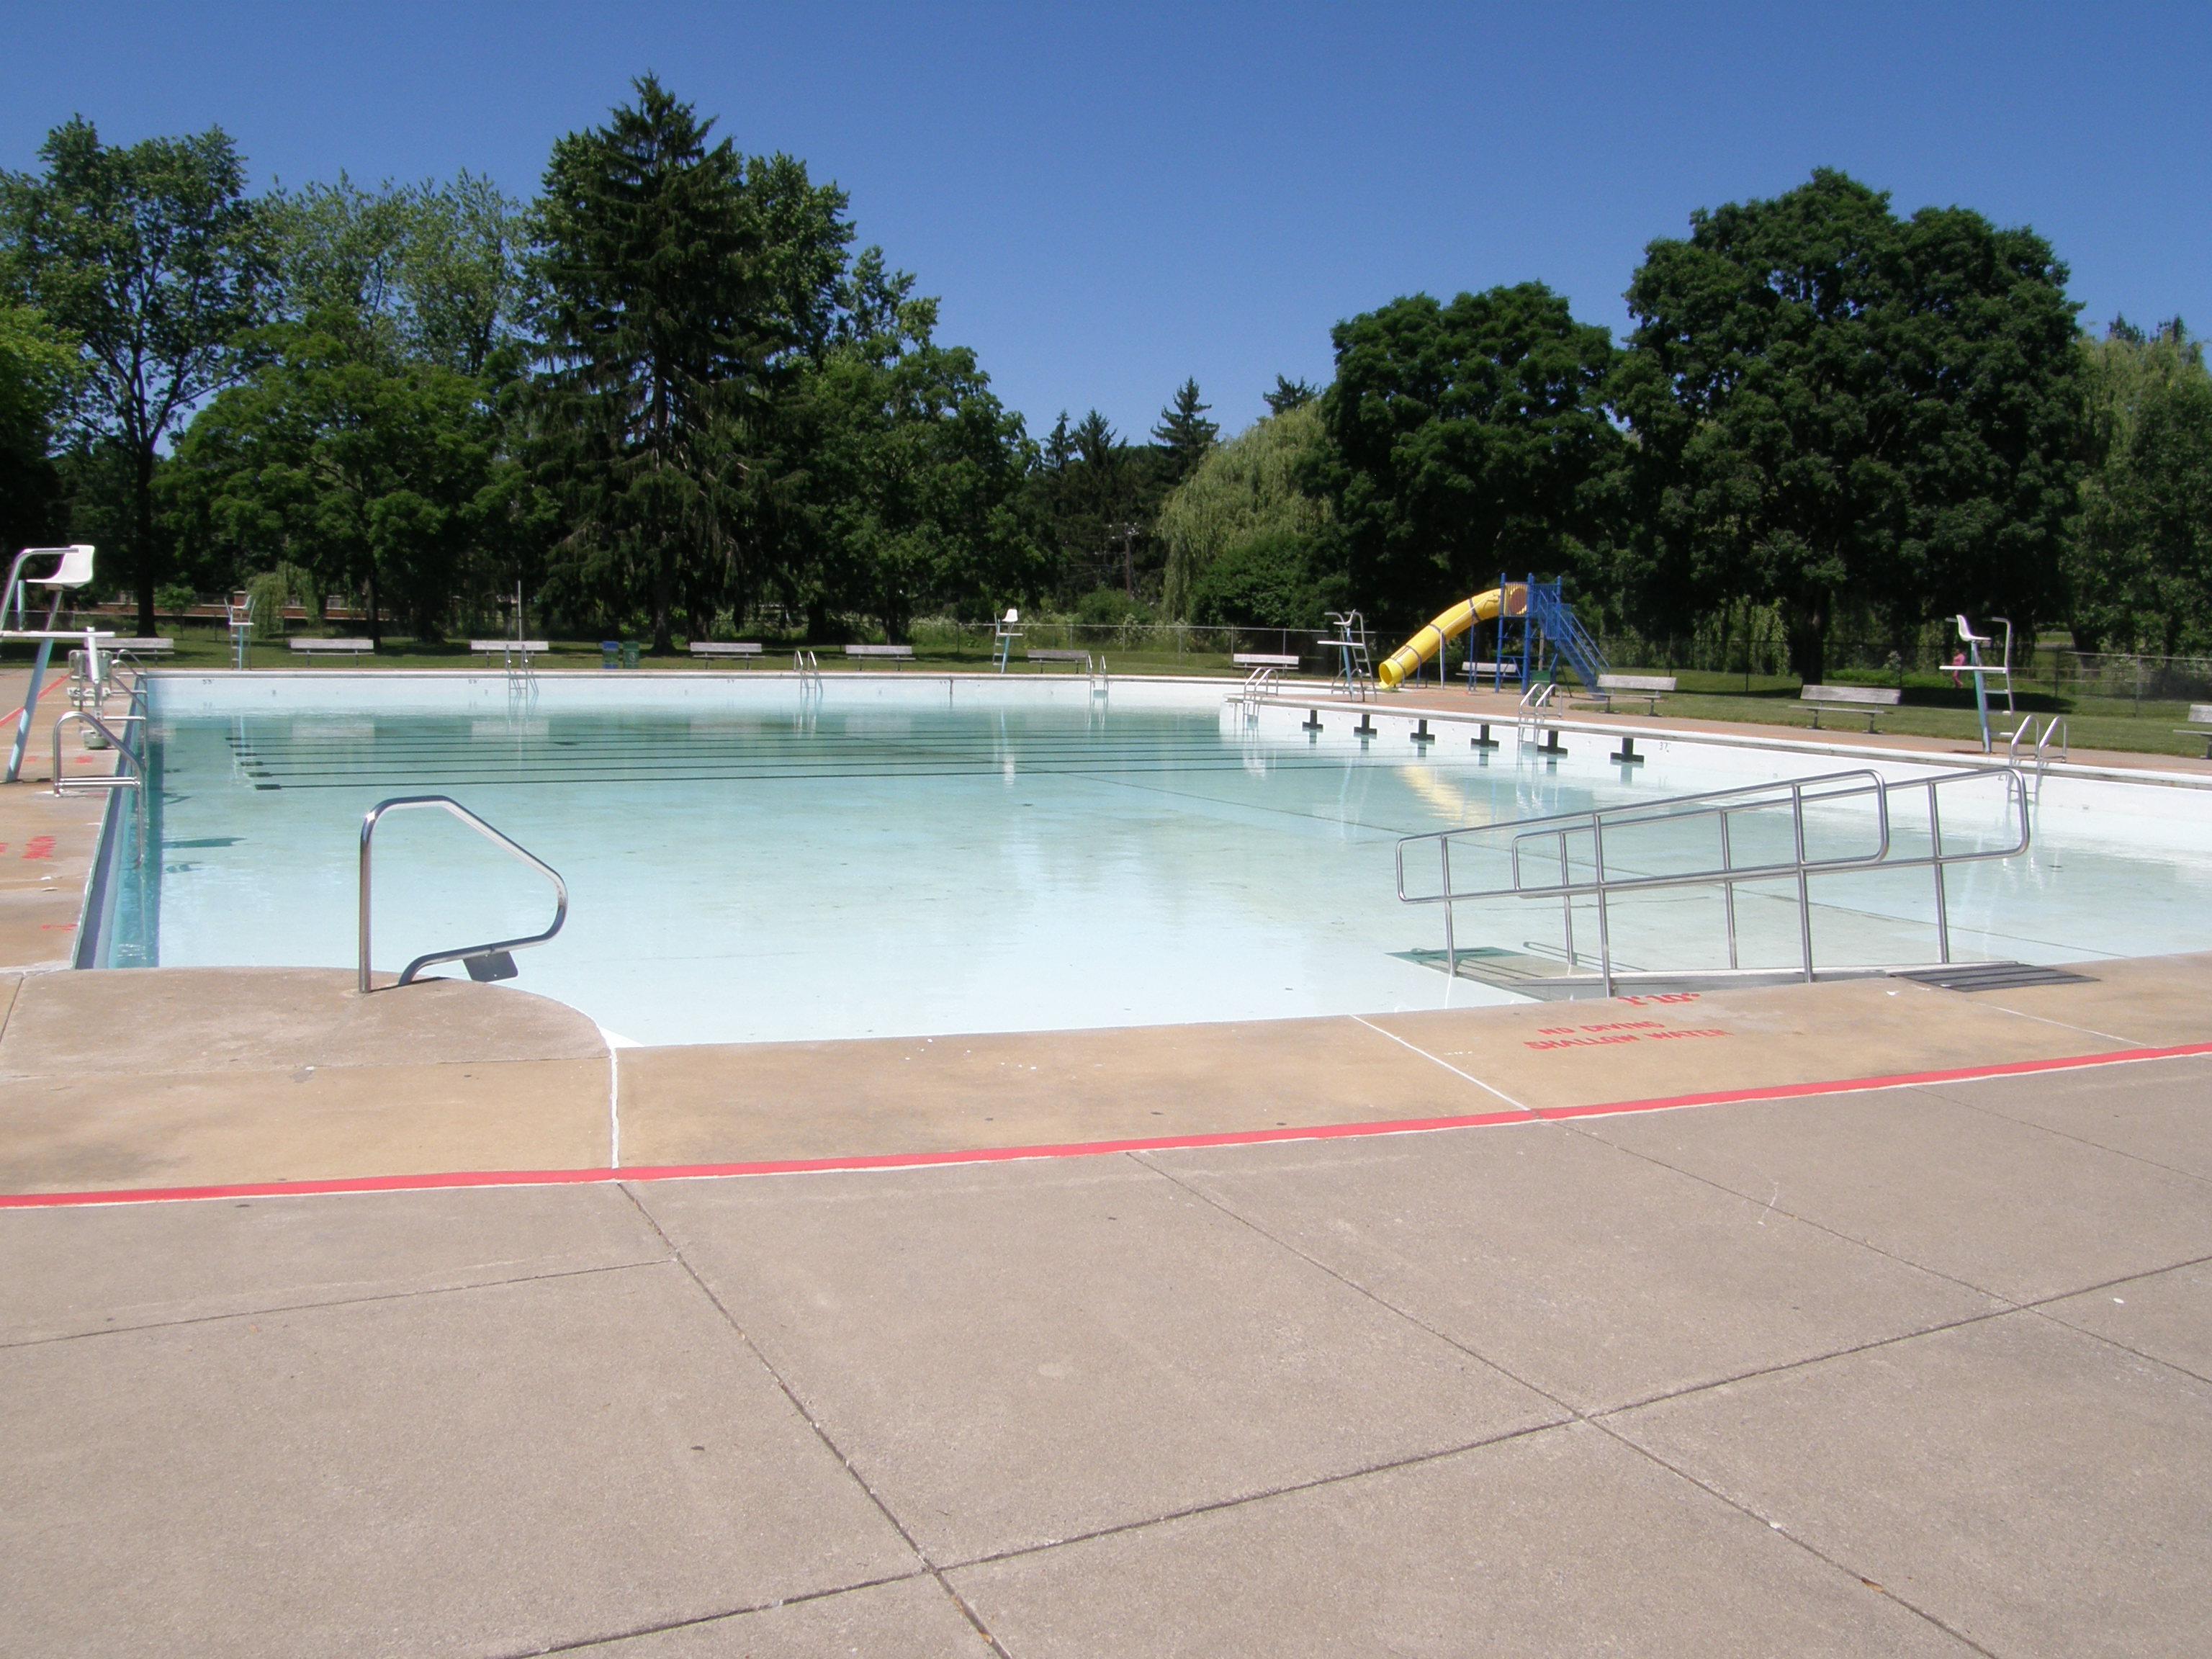 Cedar beach pool closed for repairs allentownpa gov - Cedar beach swimming pool allentown pa ...